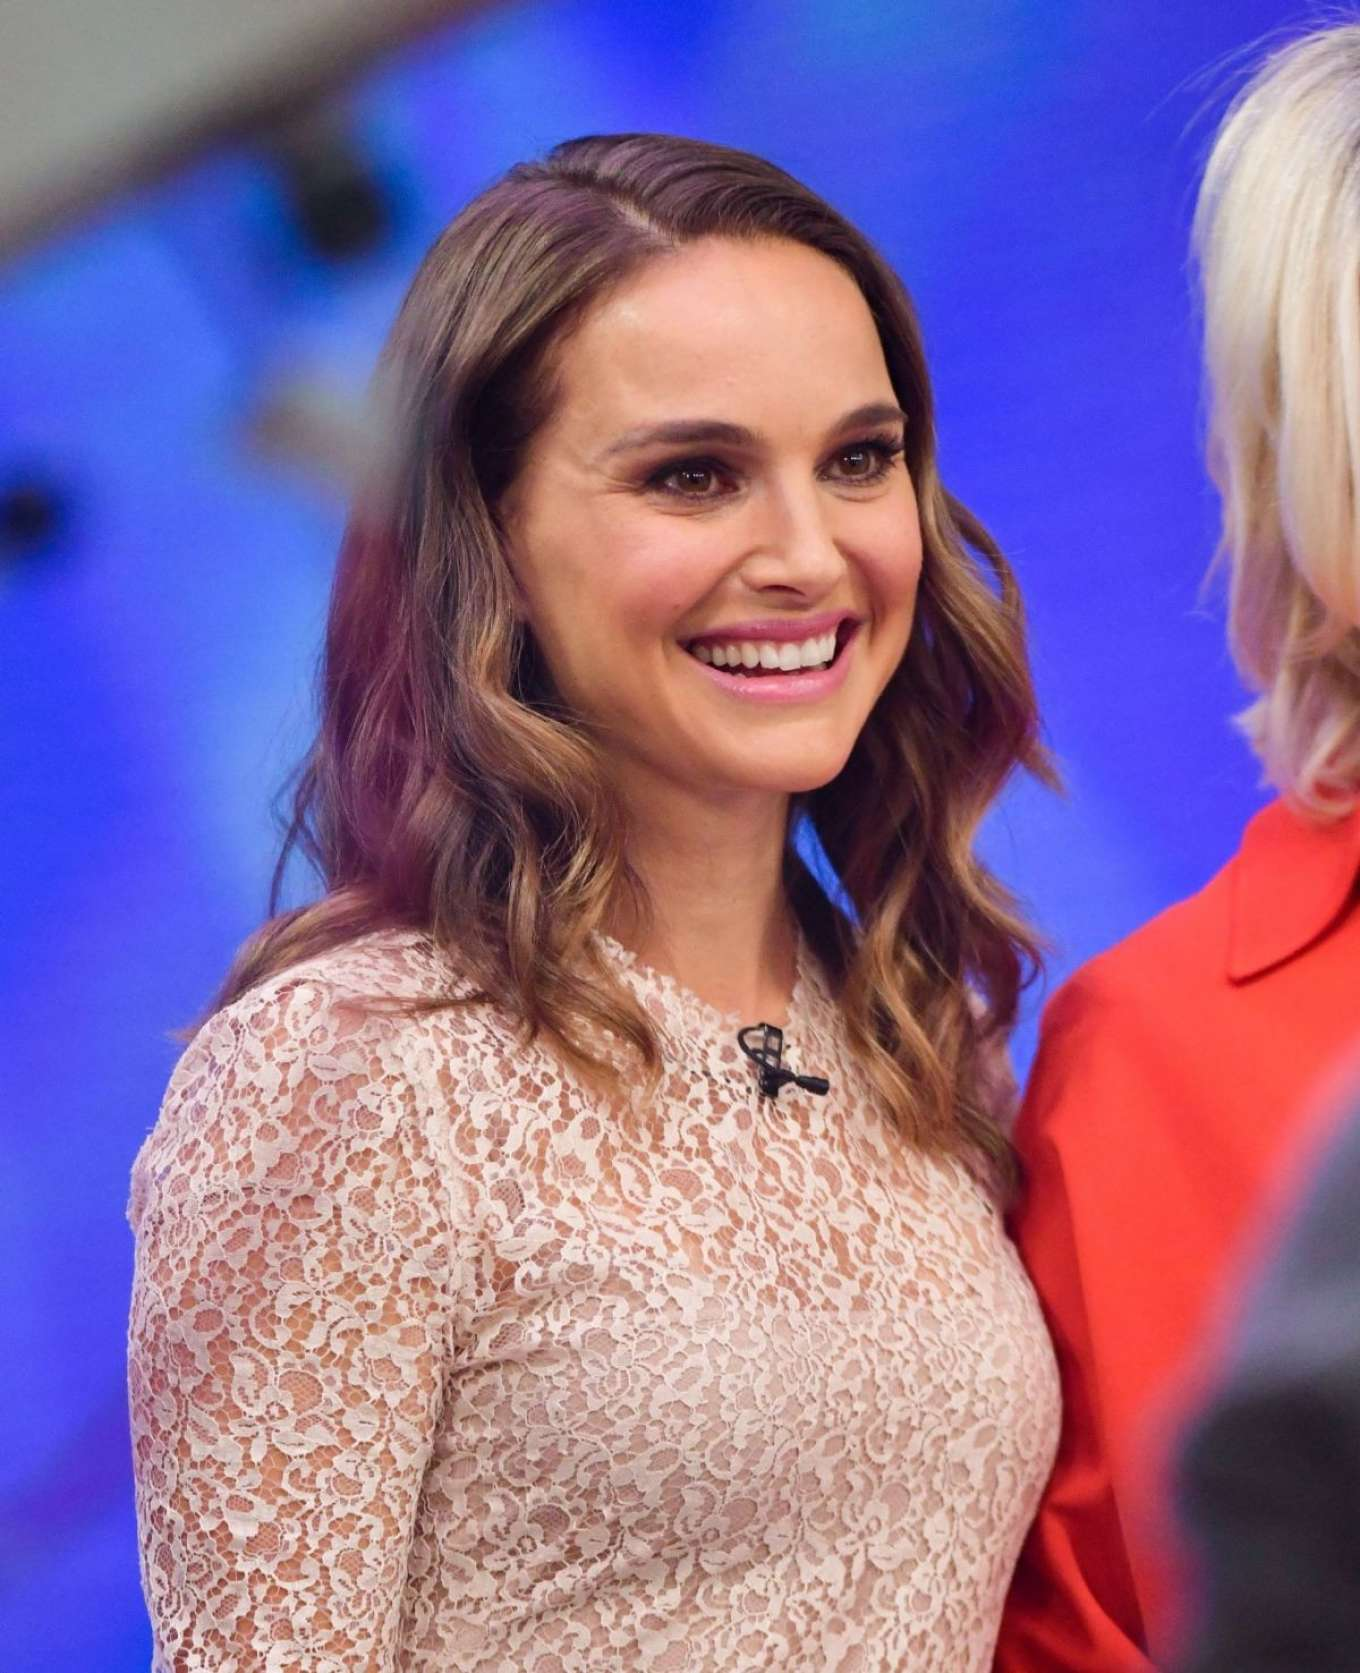 Natalie Portman 2018 : Natalie Portman: On Today Show -01